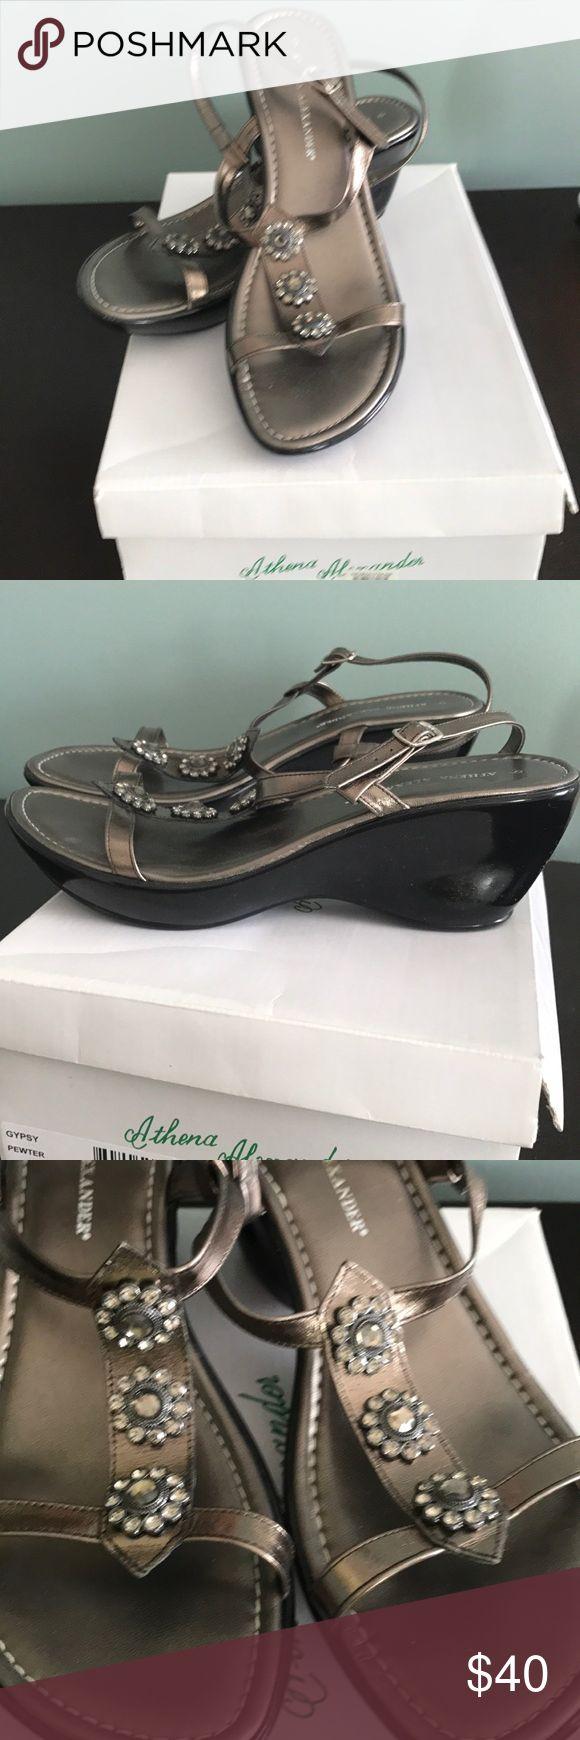 Althena Alexander pewter sandals Althena Alexander Gypsy pewter metallic jeweled wedge sandals. Size 9M. Never worn. Athena Alexander Shoes Sandals